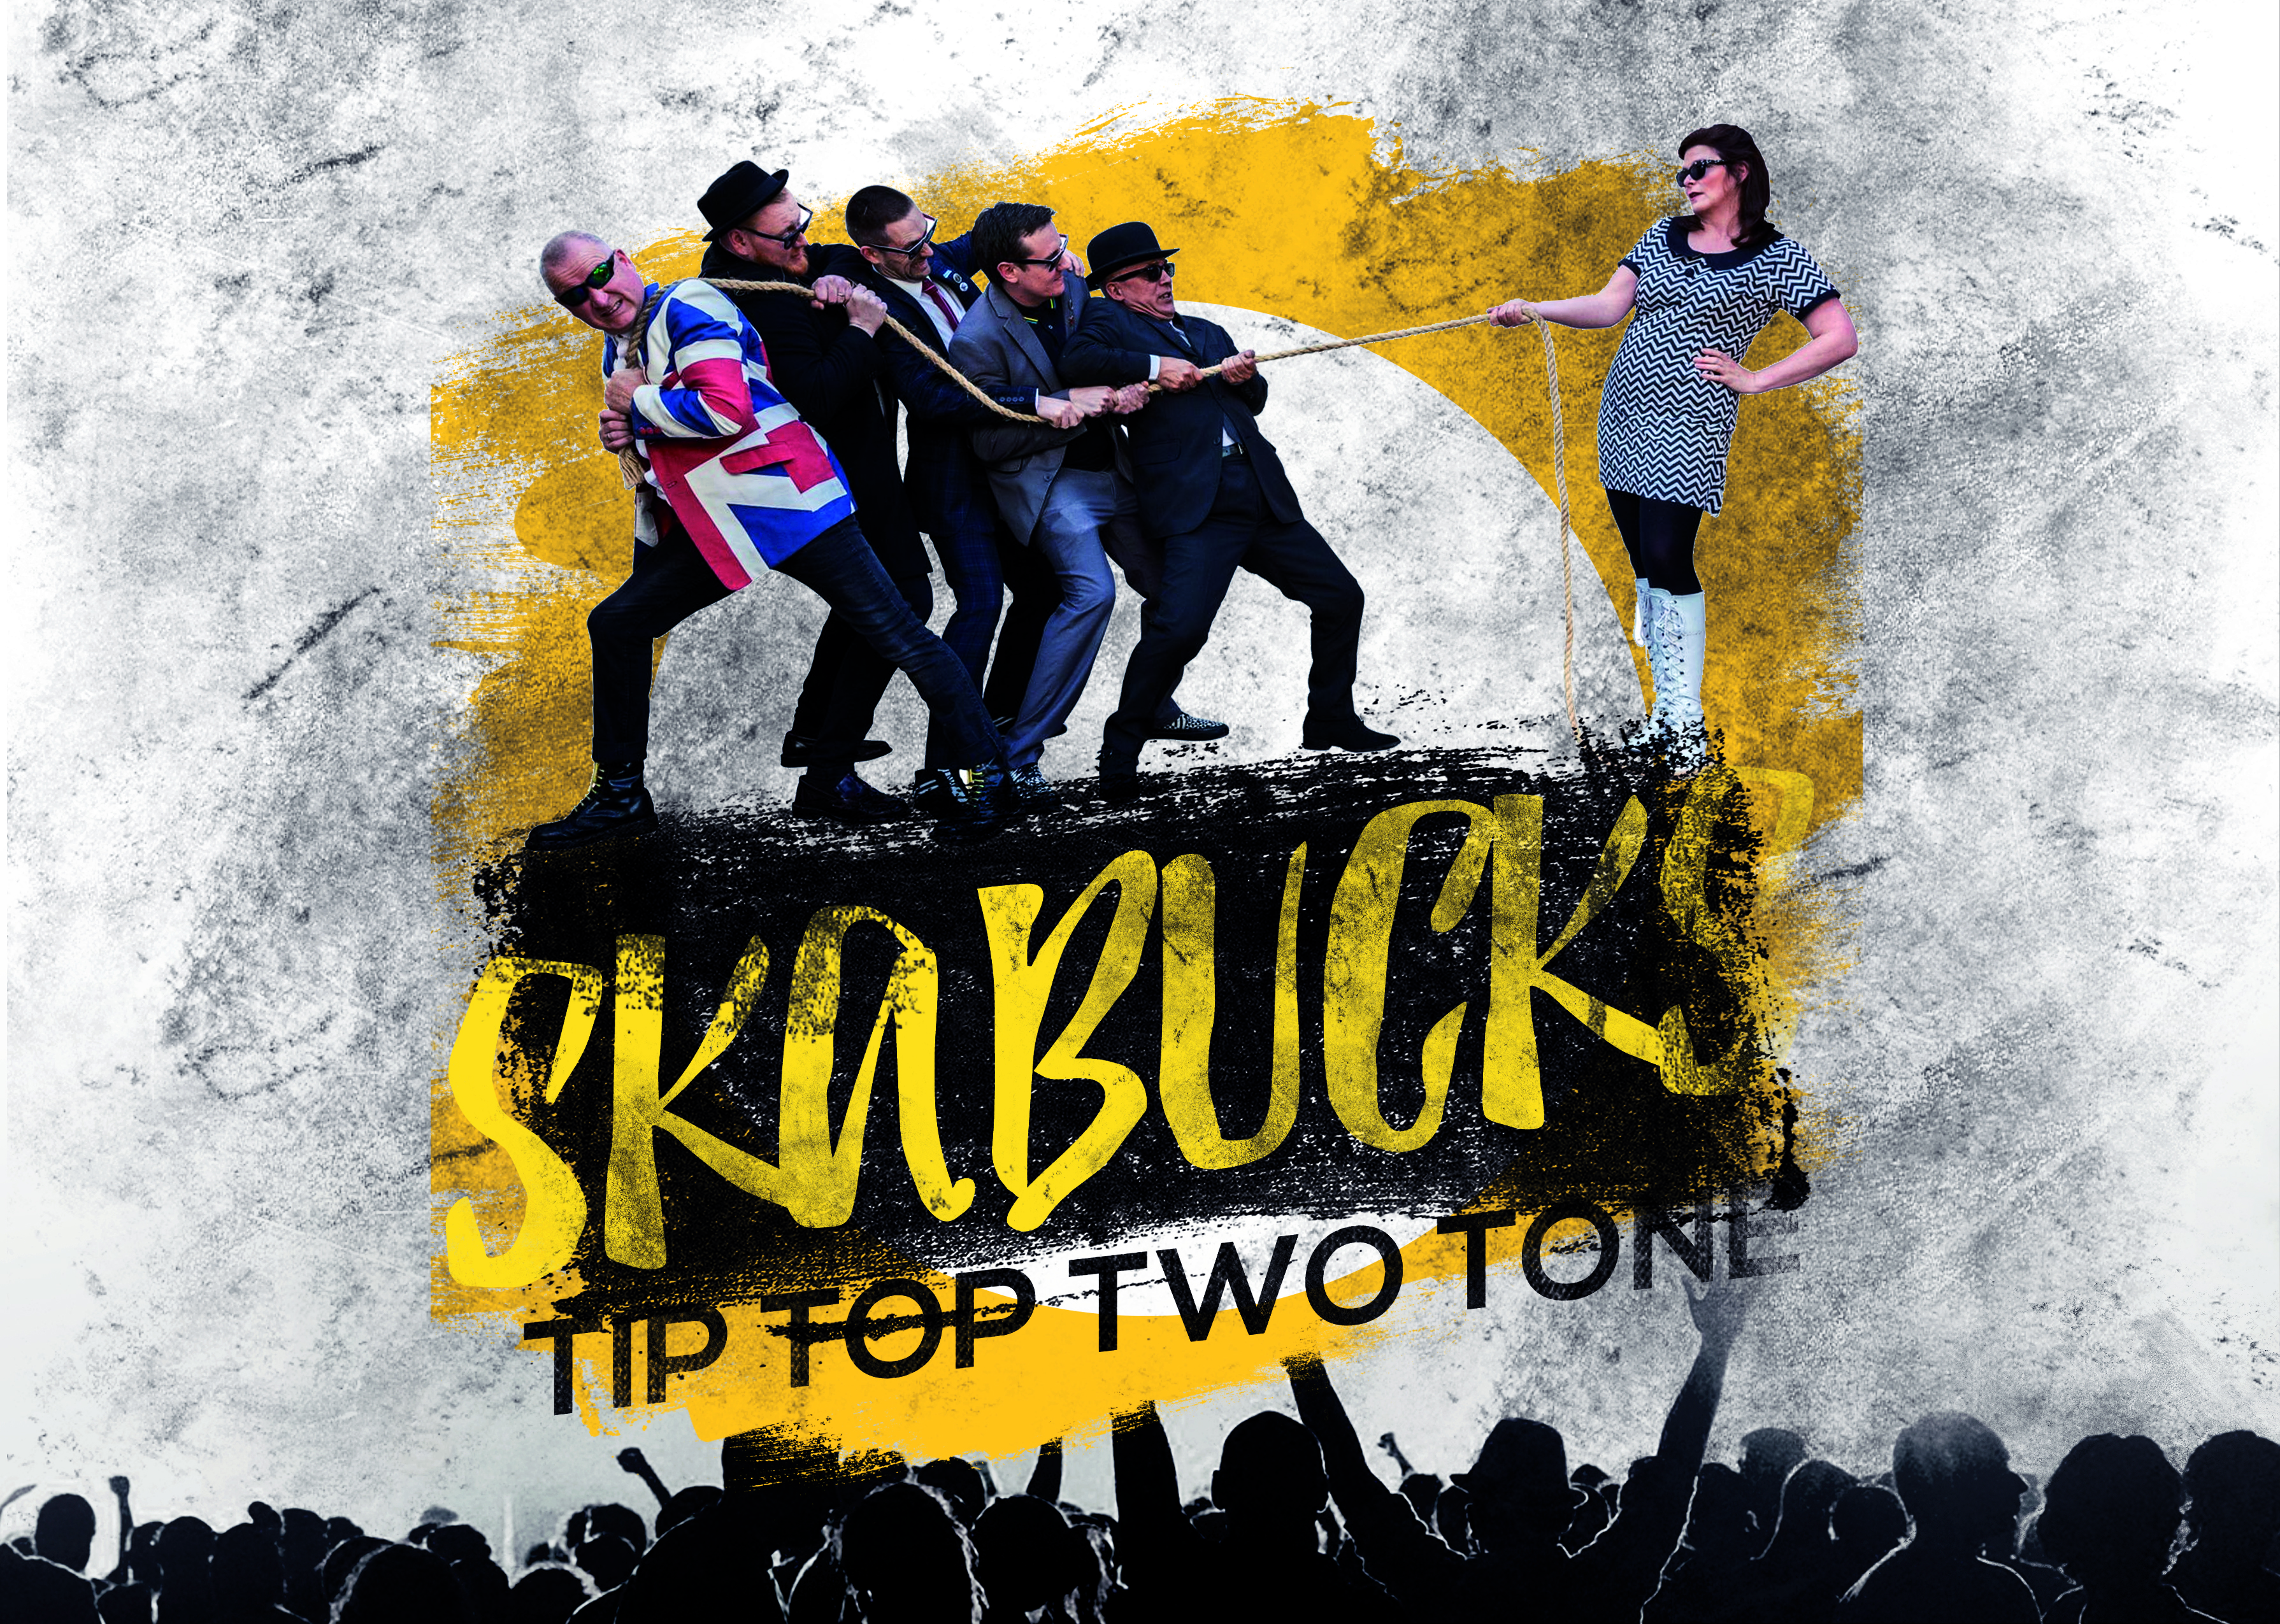 Skabucks